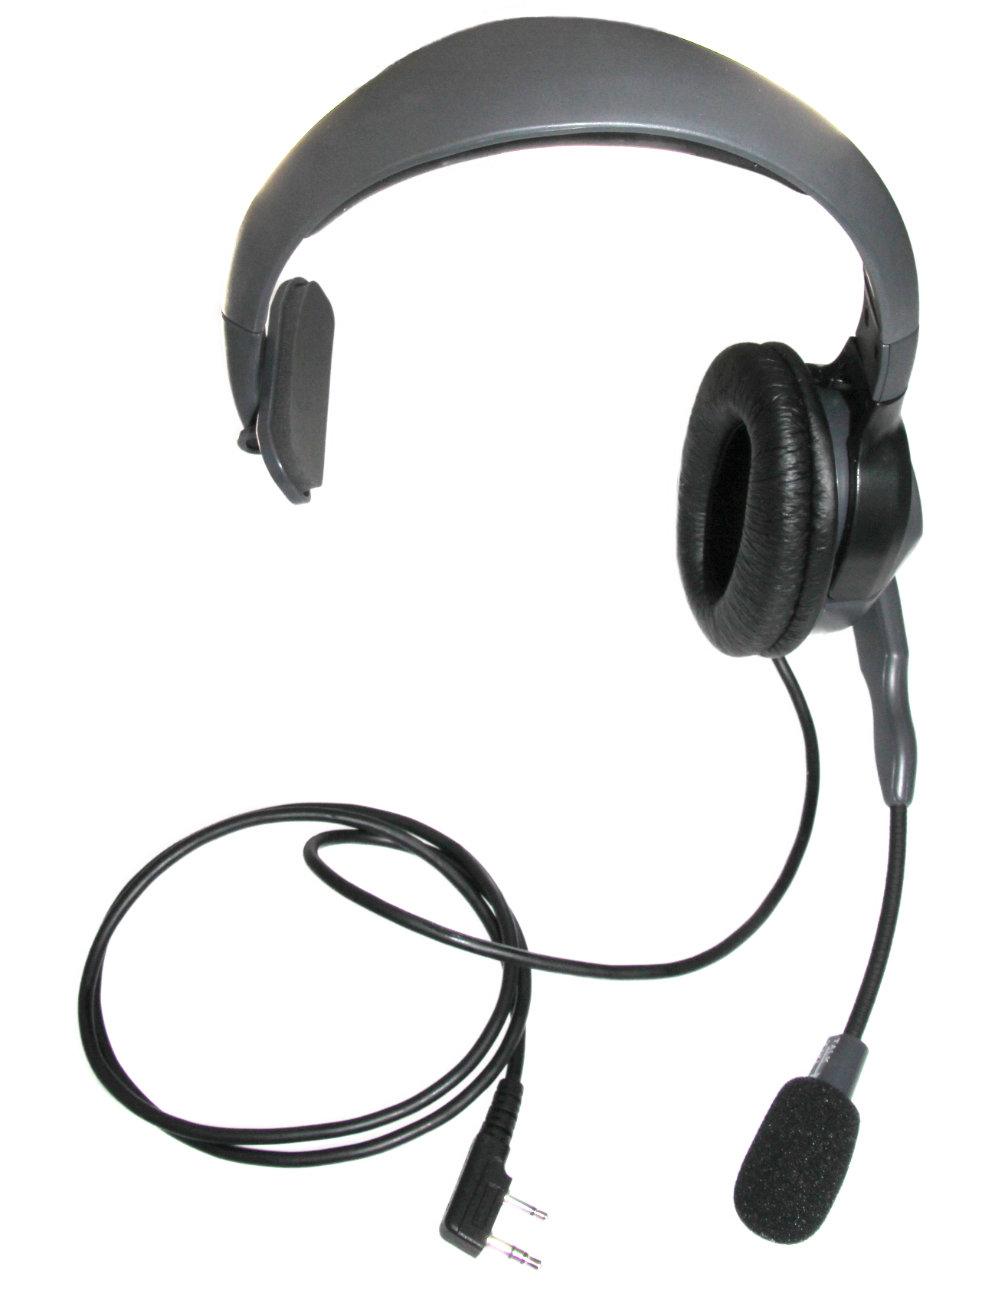 Artikelfoto EARTEC MAX 4G SINGLE Kopfhörer-Mikrofon Headset